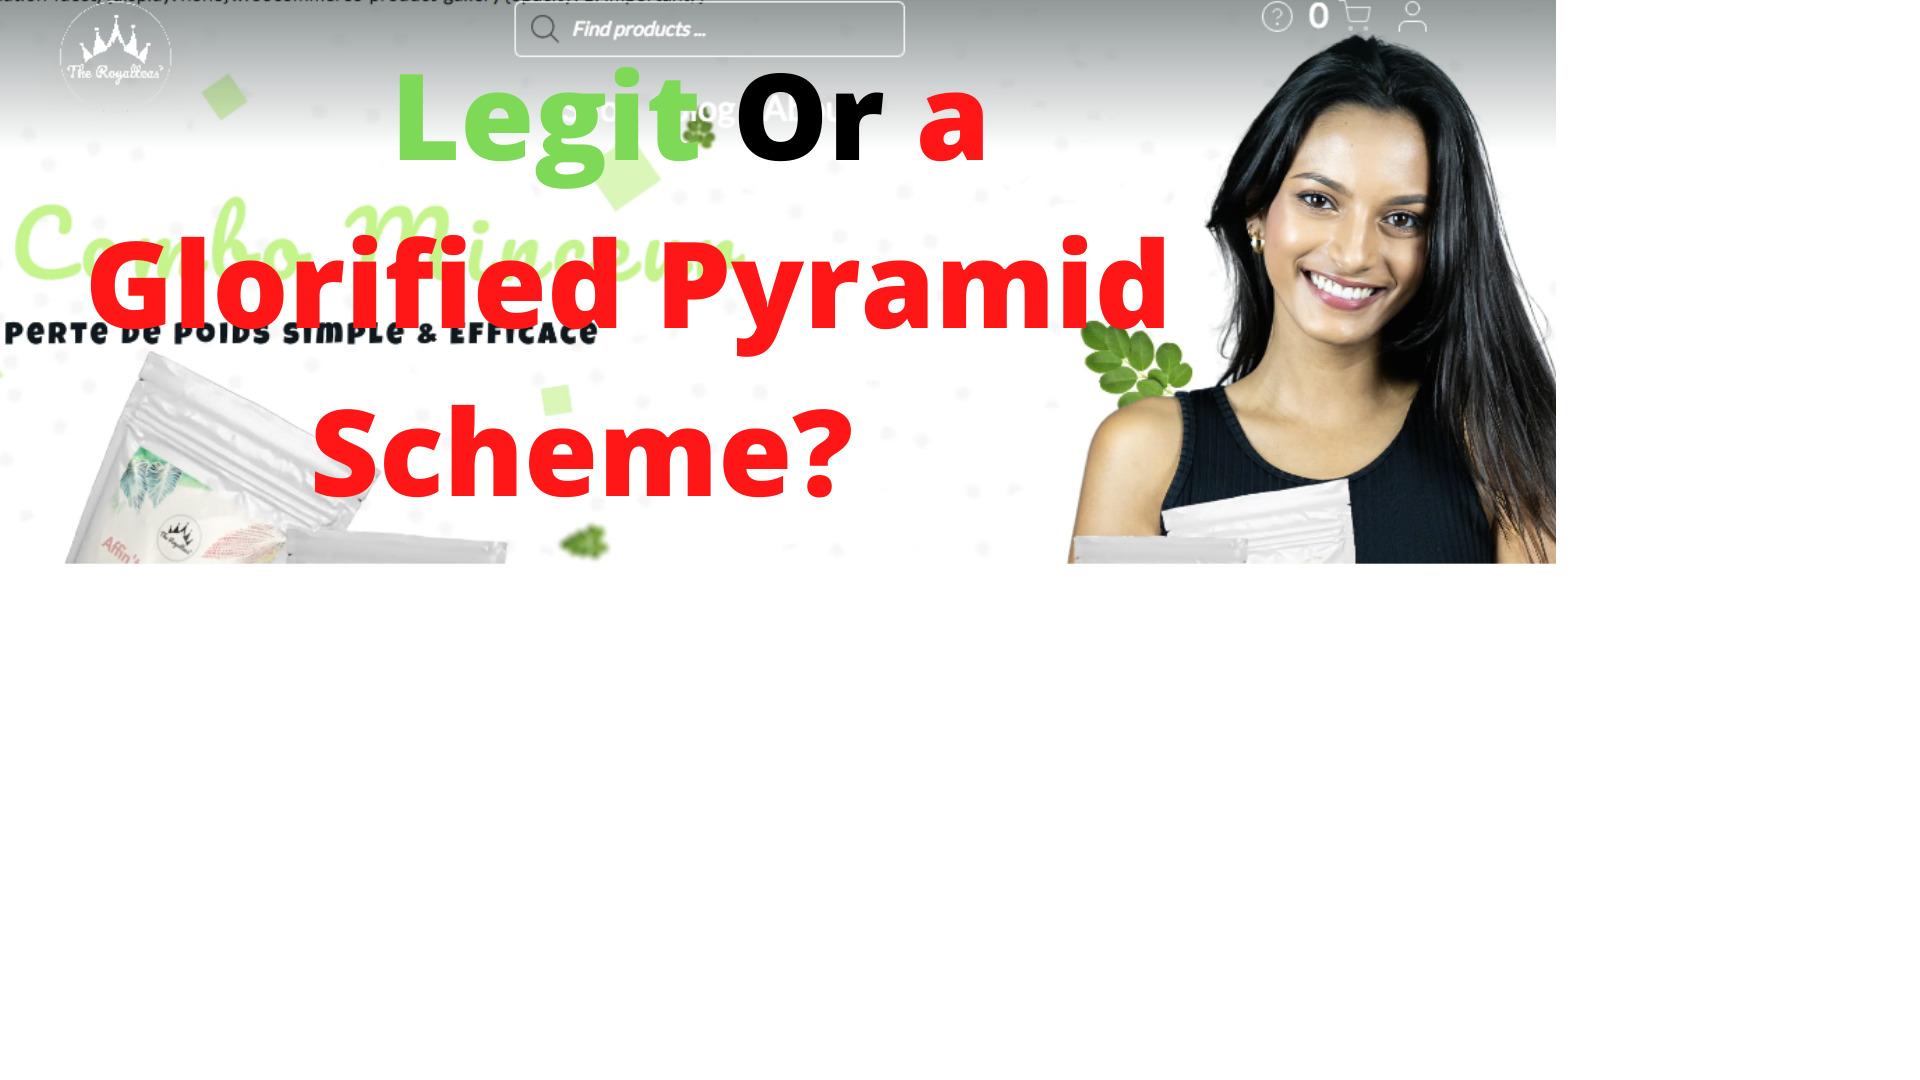 Legit Or a Glorified Pyramid Scheme